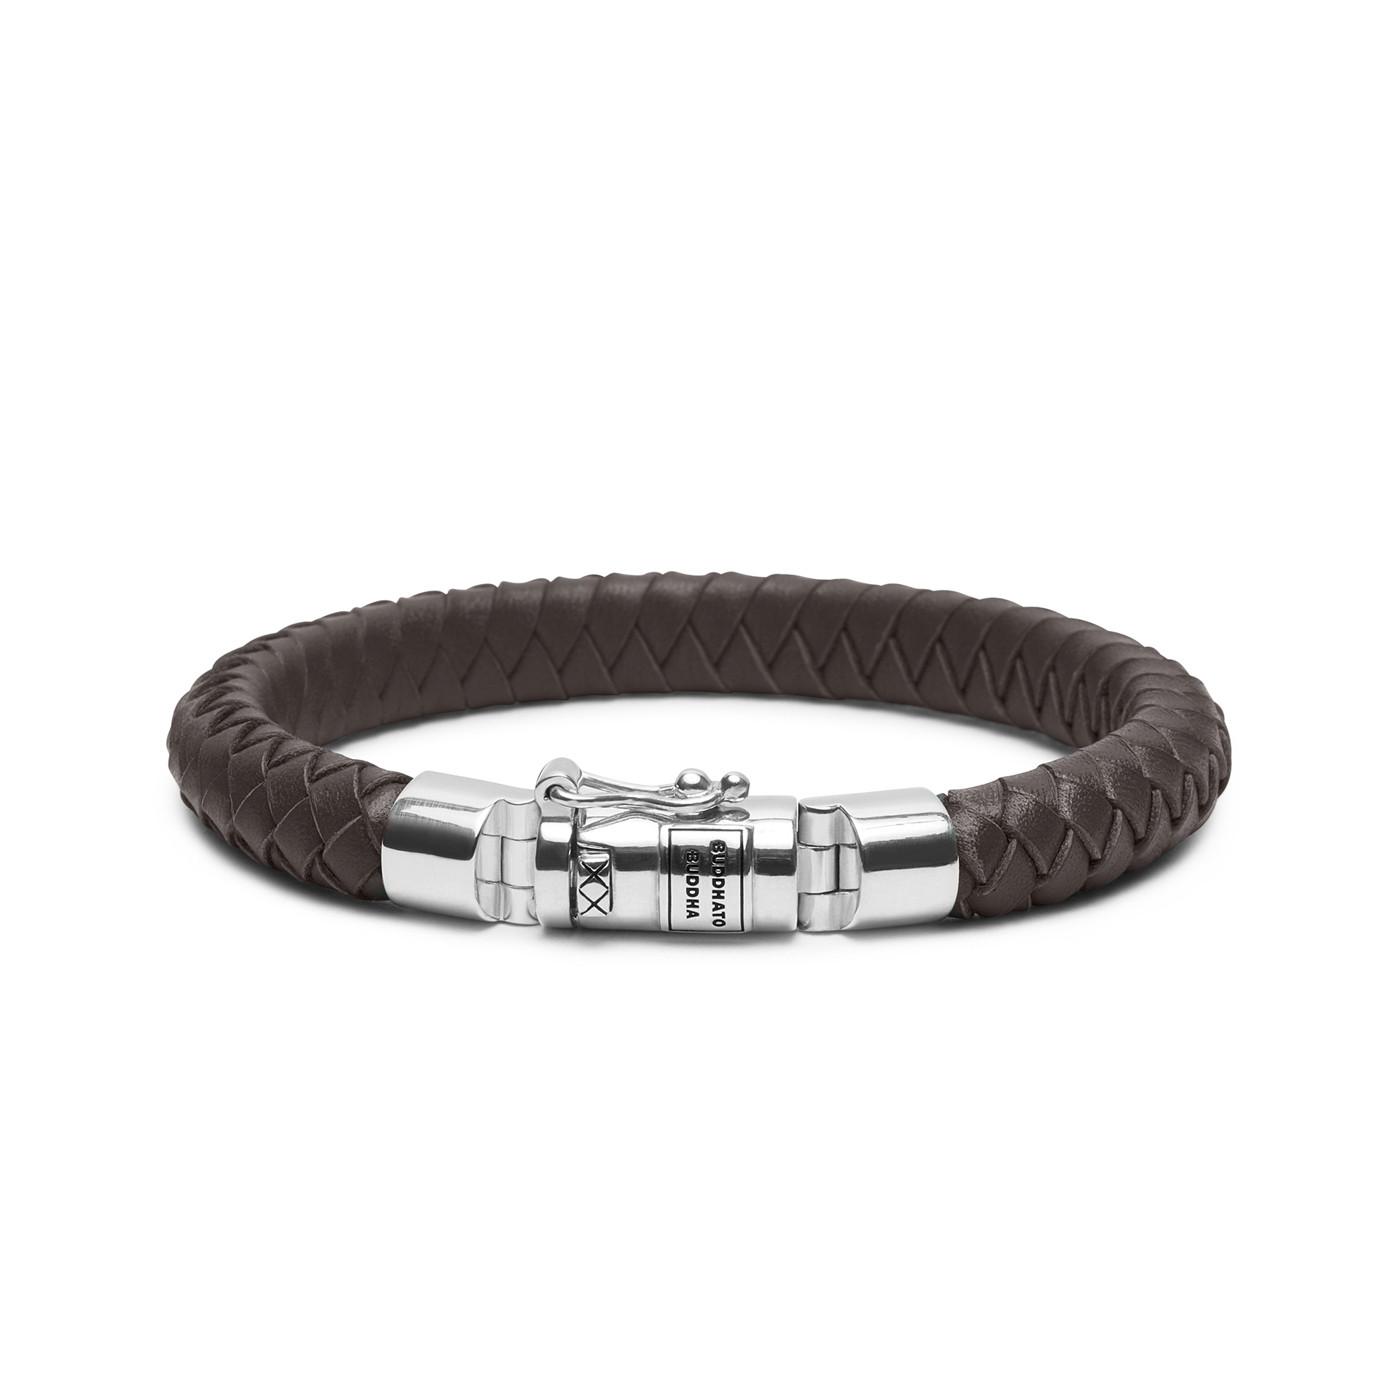 Buddha to Buddha Ben Small Leather Brown Armband 180BR-D (Lengte: 18.00-23.00 cm)